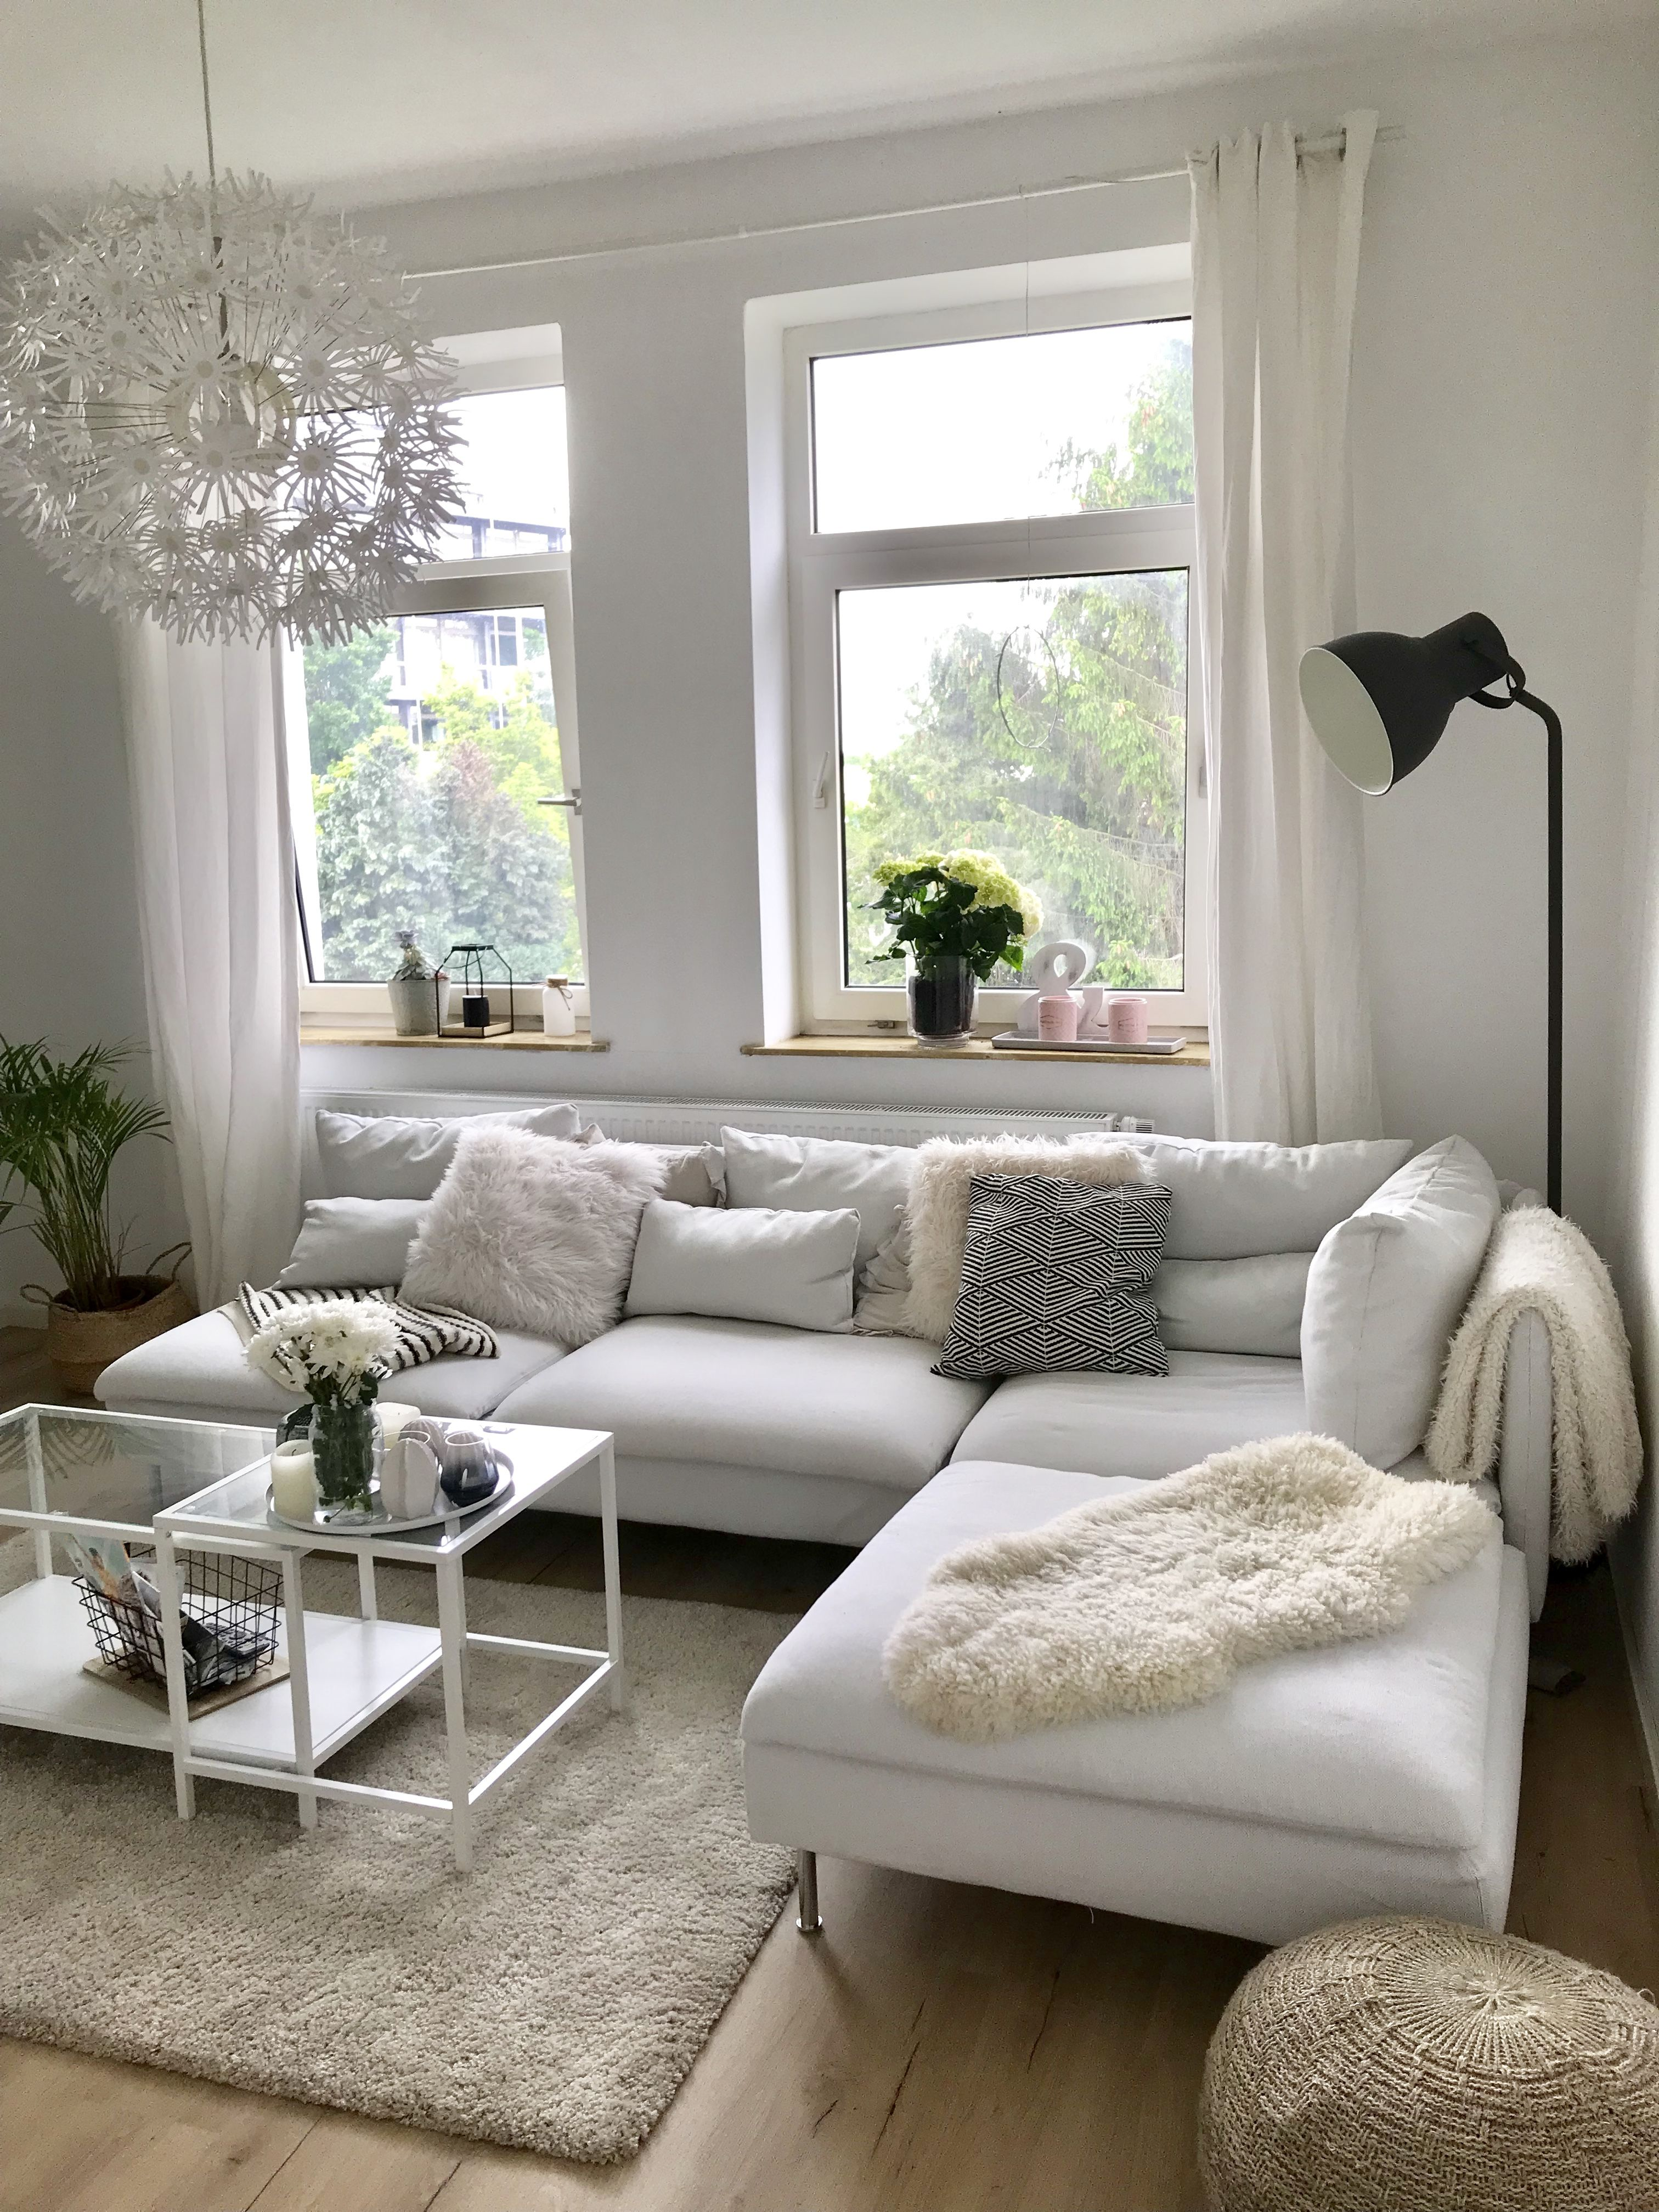 ikea inspirationen söderhamn Ikea oturma odası